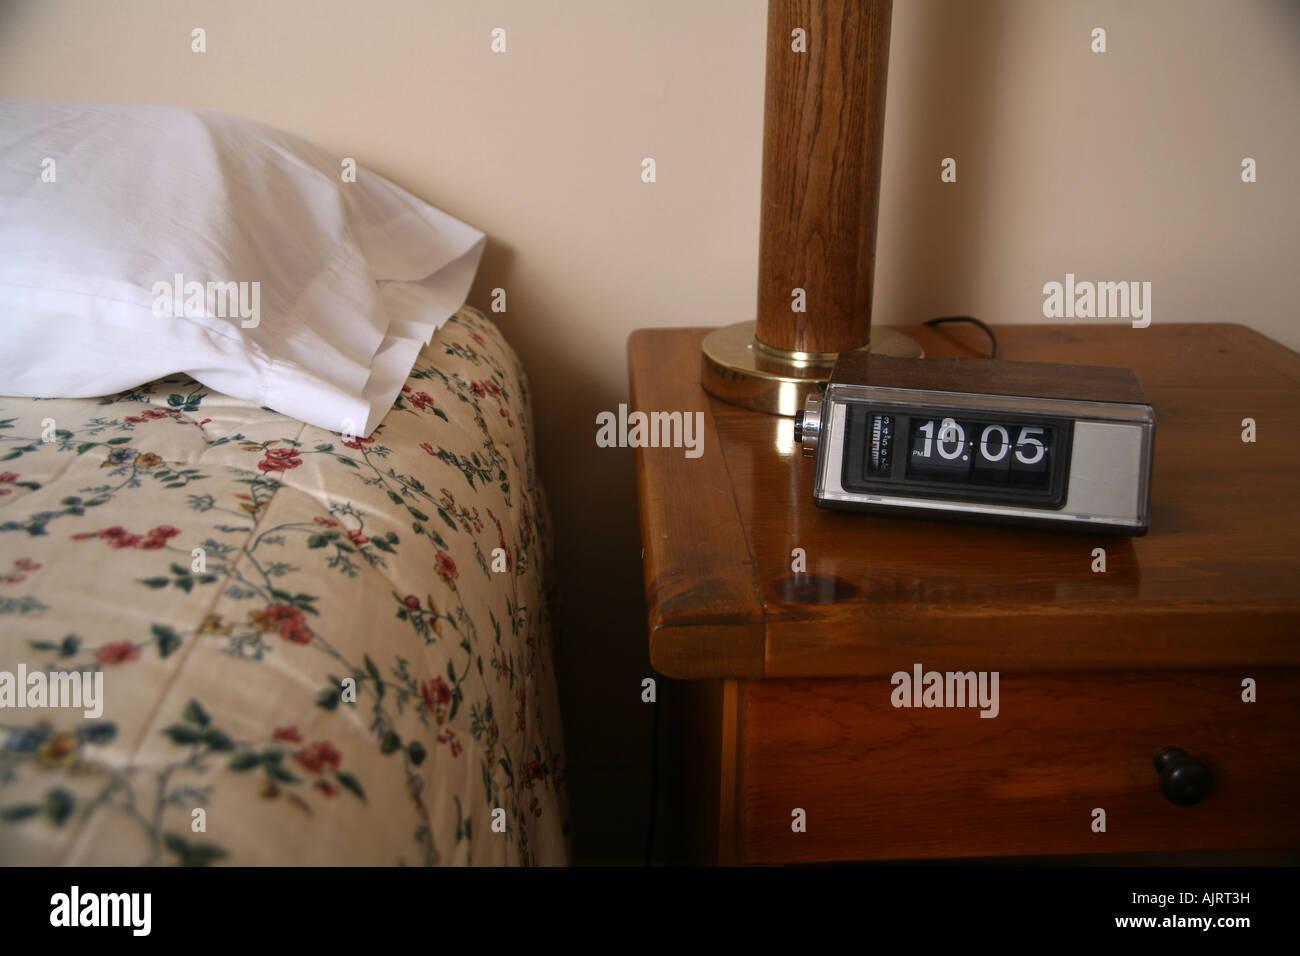 Alarm Clock In Bedroom Stock Photo, Royalty Free Image